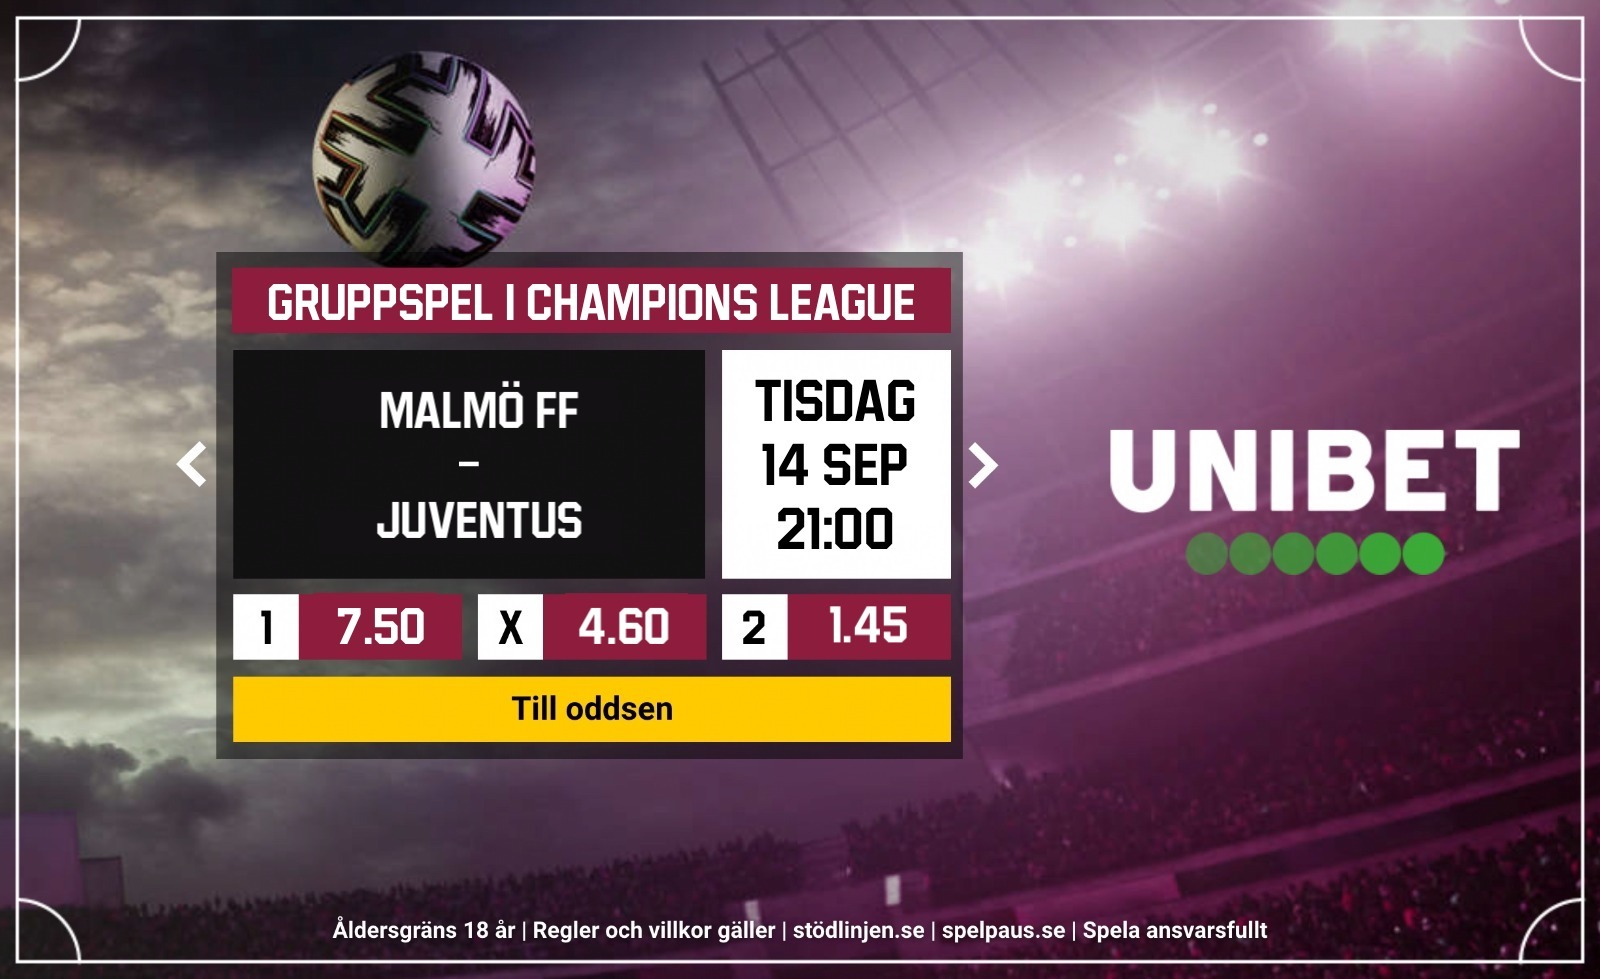 Streama MFF Juventus livestream gratis